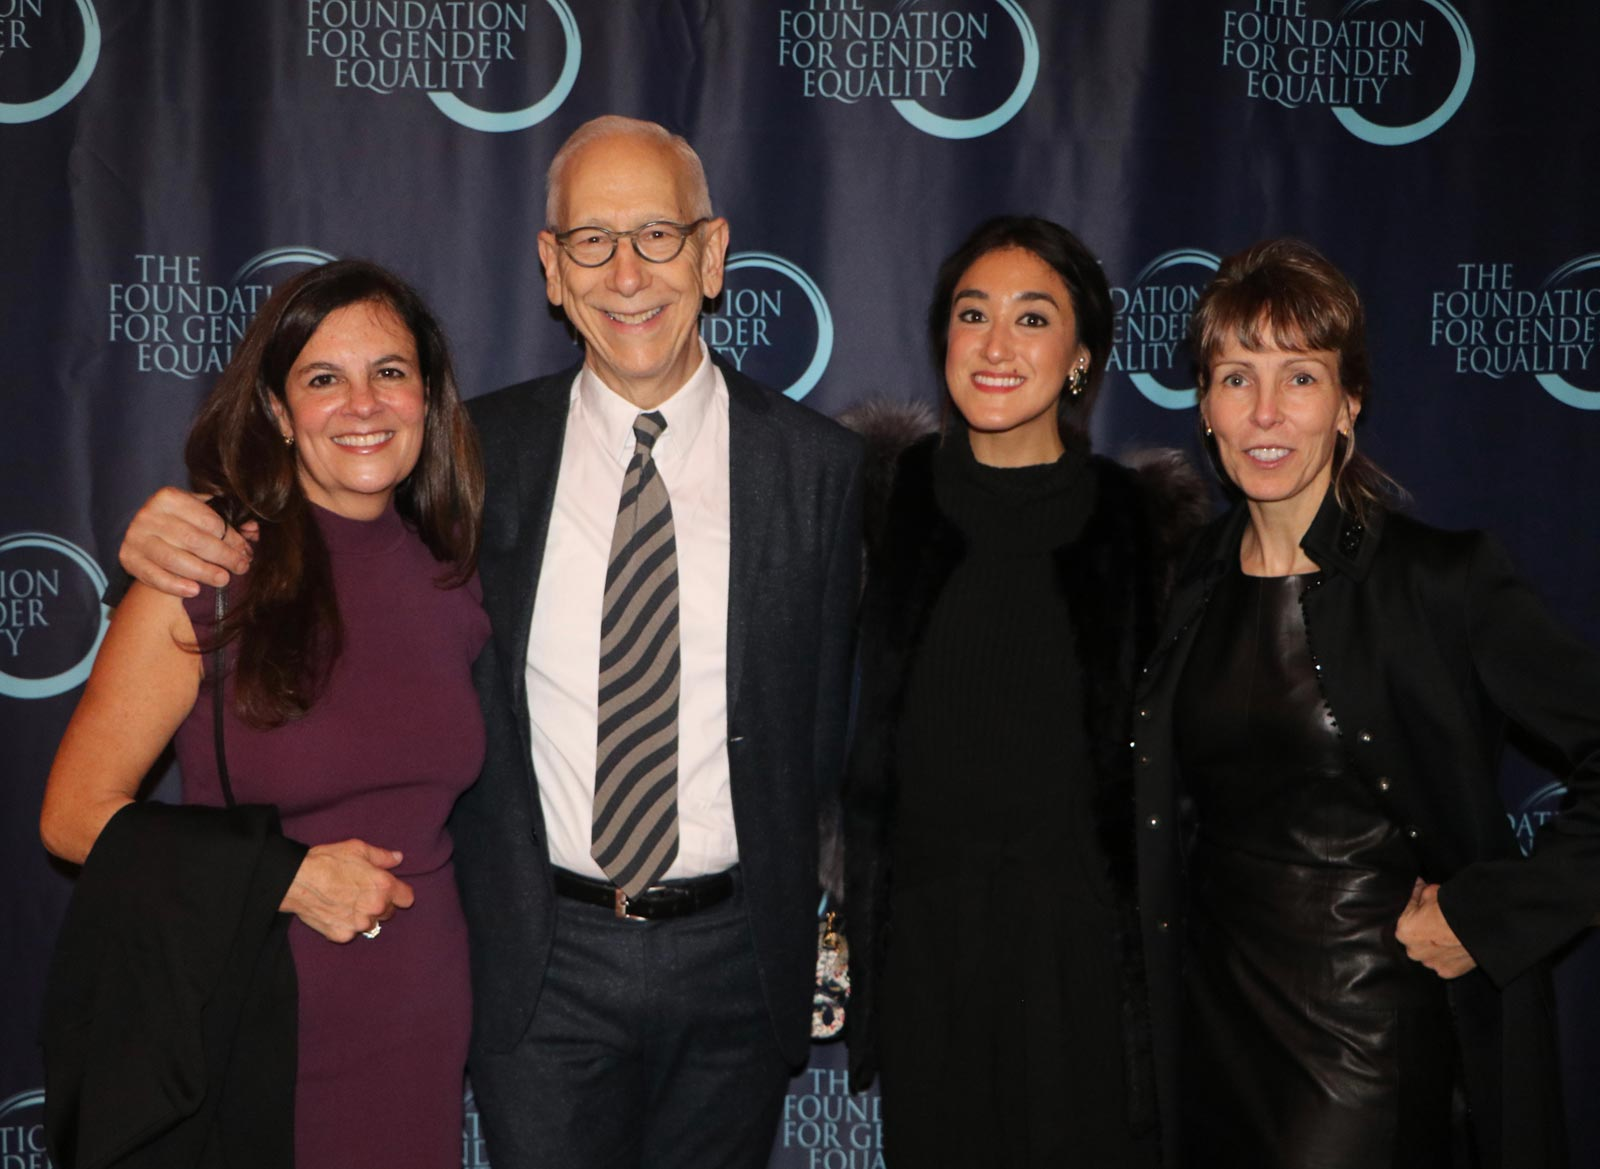 Lisa Mercurio, Michael Slade, Lavon Kellner